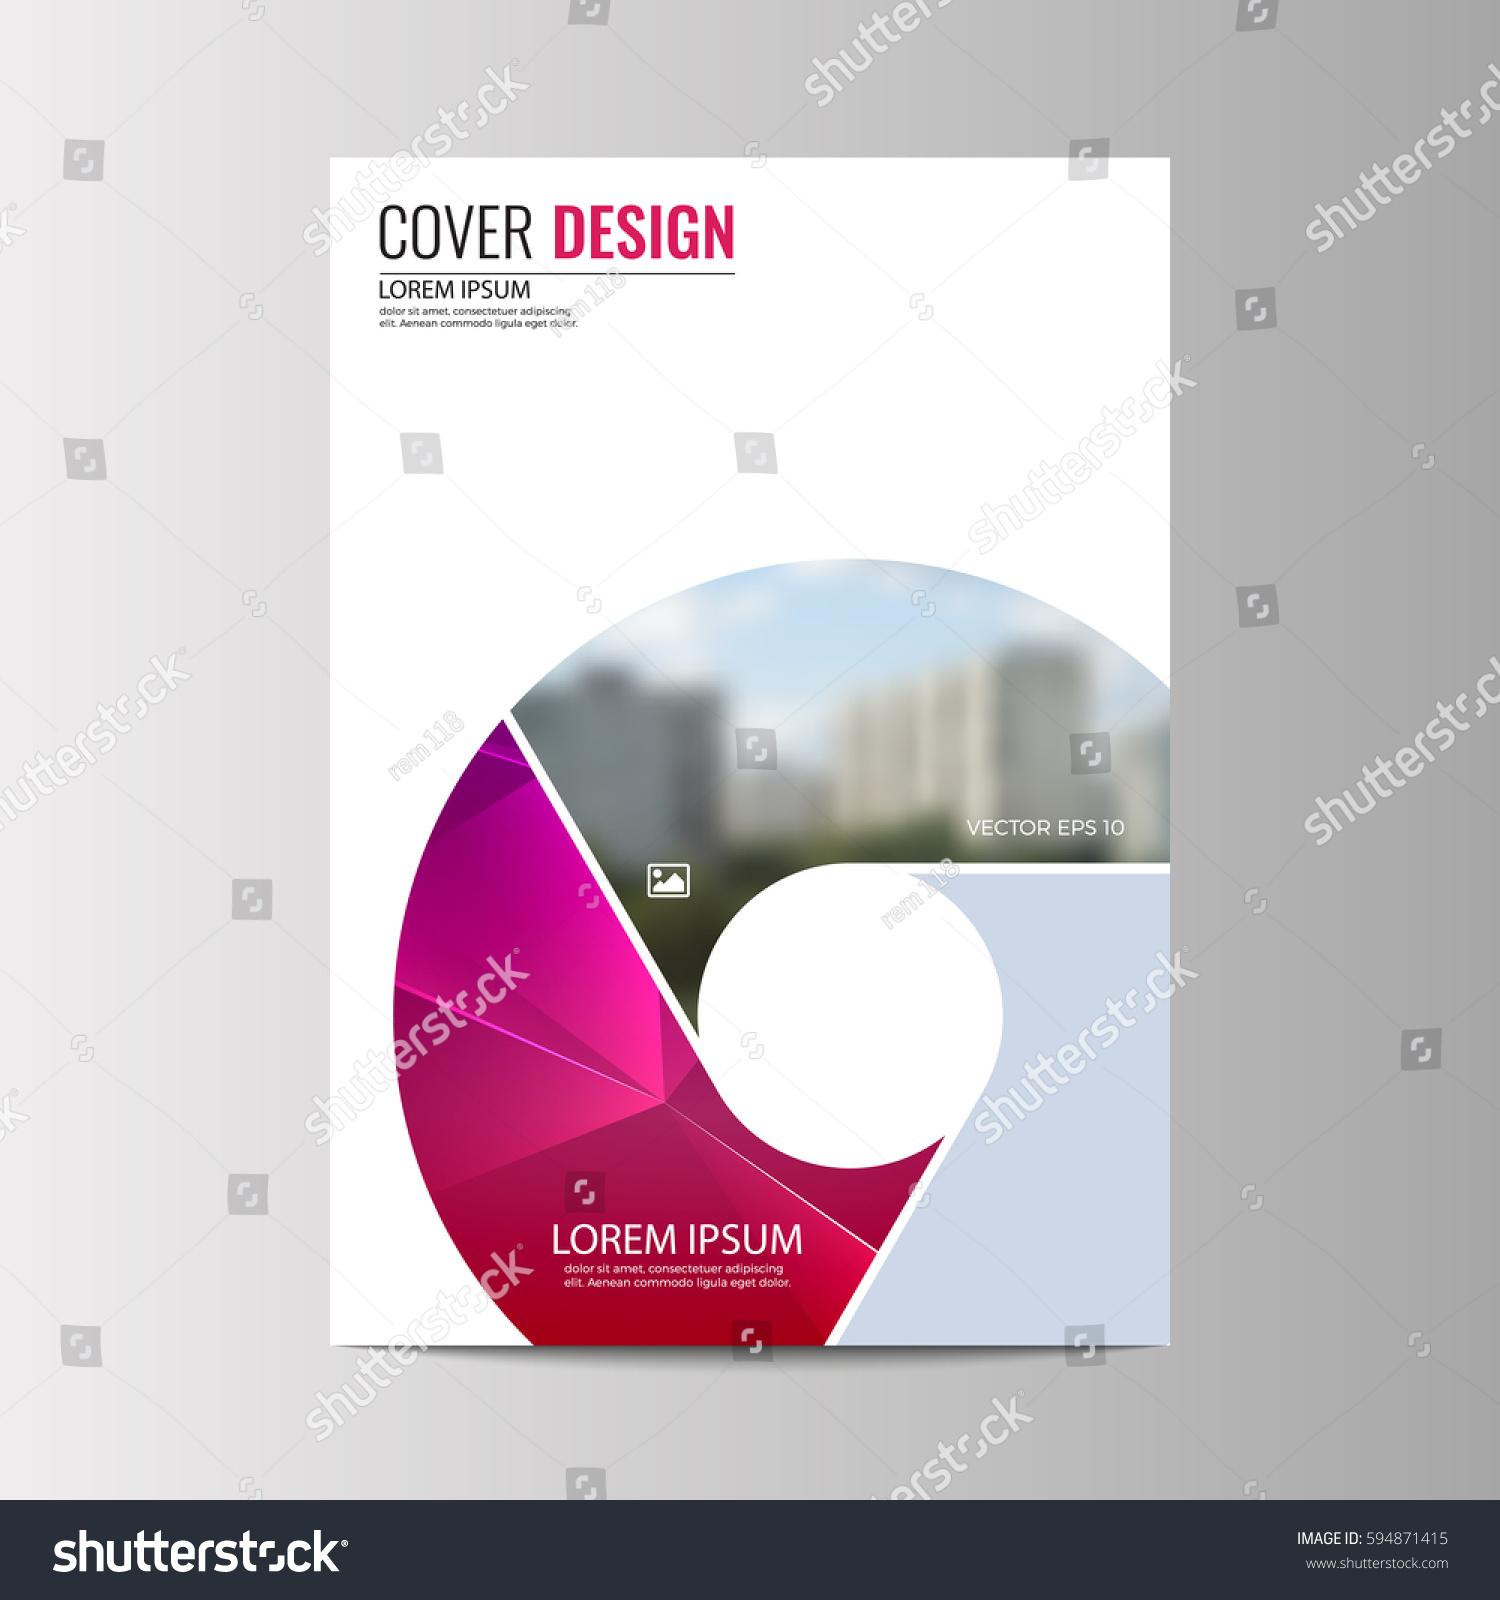 online design brochure - online image photo editor shutterstock editor